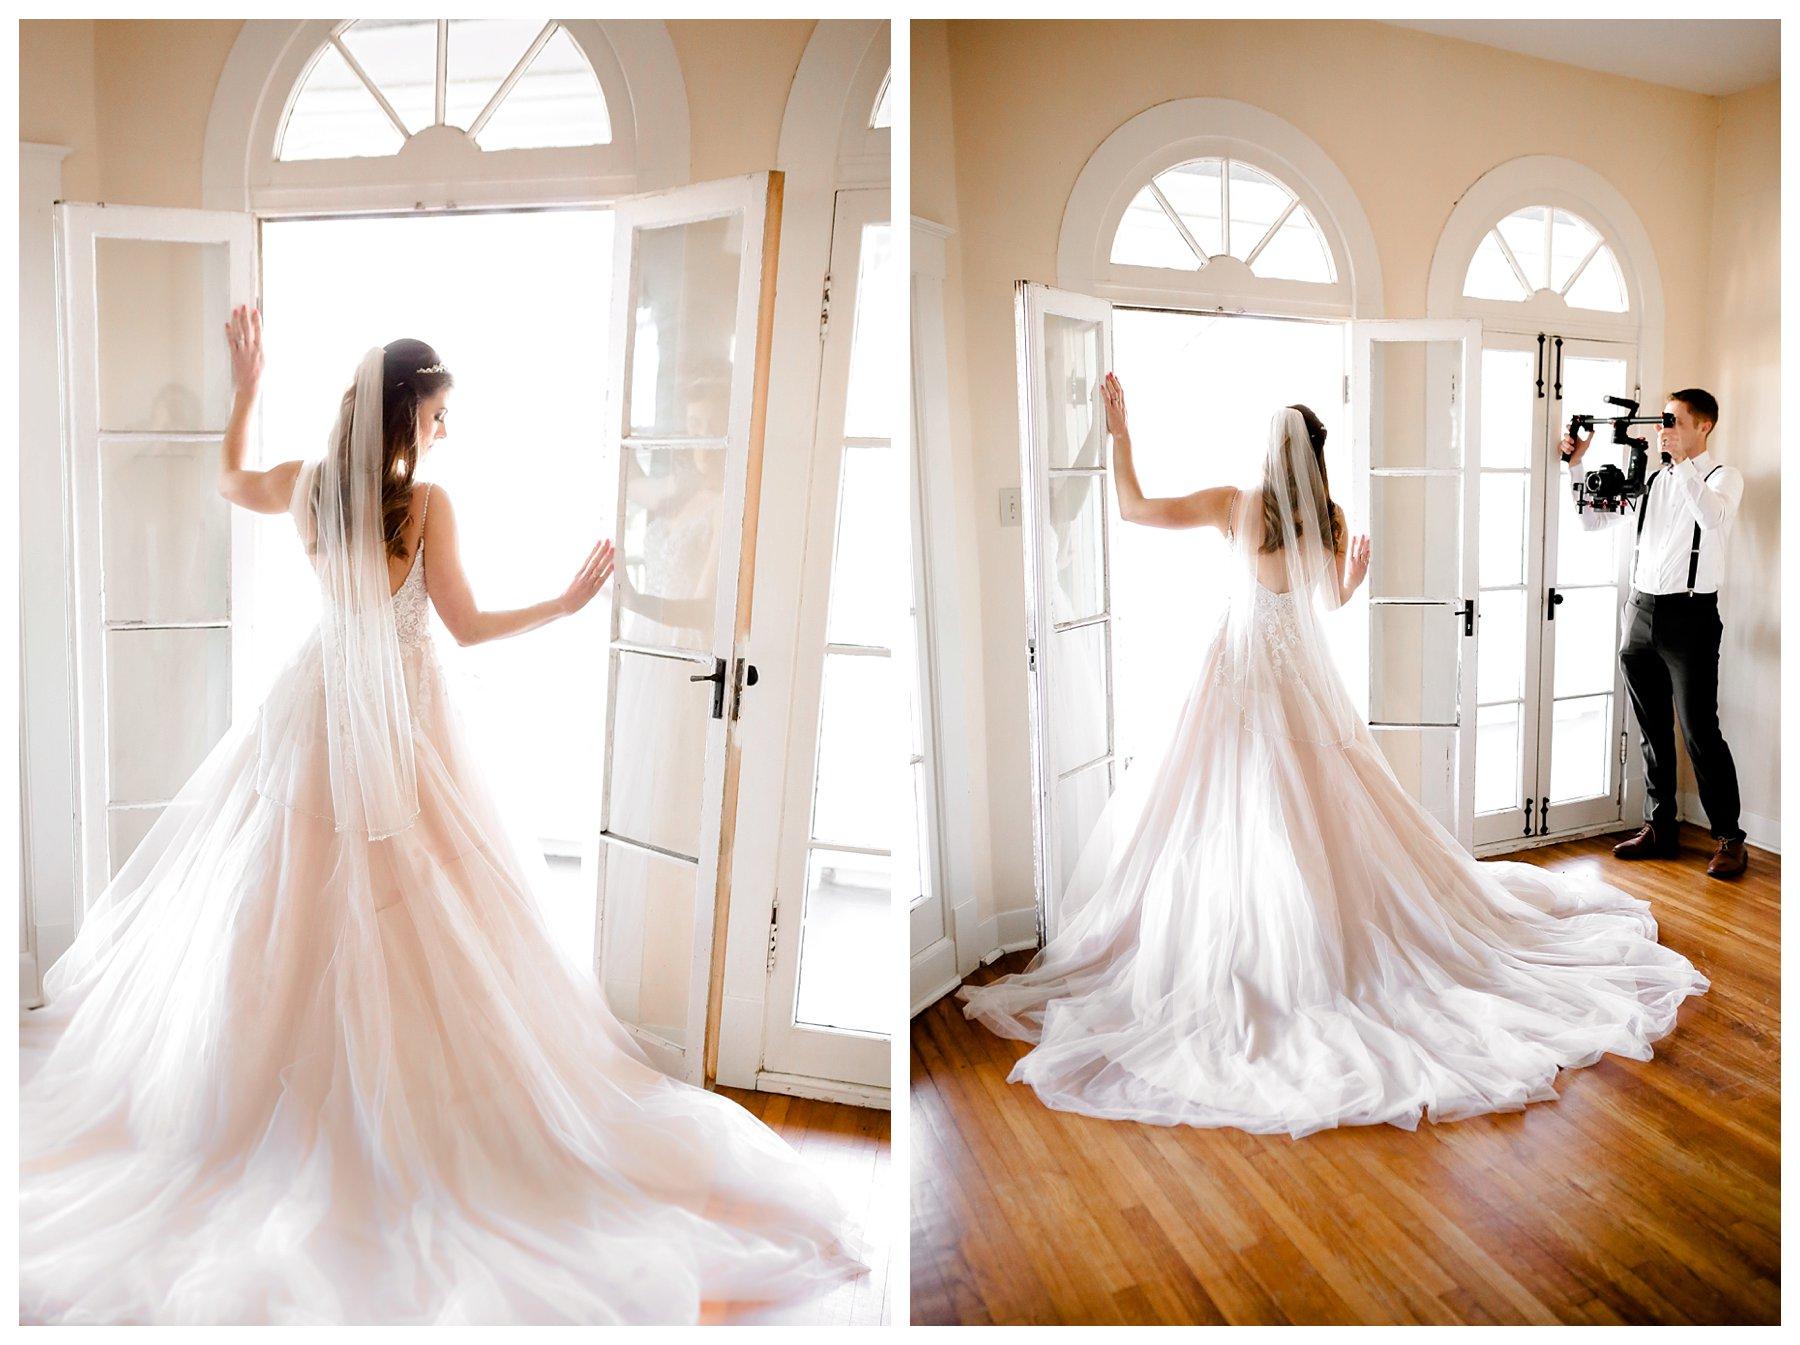 photographer_wedding_saint_louis_Kansas_City_Photography_Videography_workshop_training_styled_engagement_Lake_Ozark_KC_MO_STL_Rolla_Hermann_Saint_James_0375.jpg